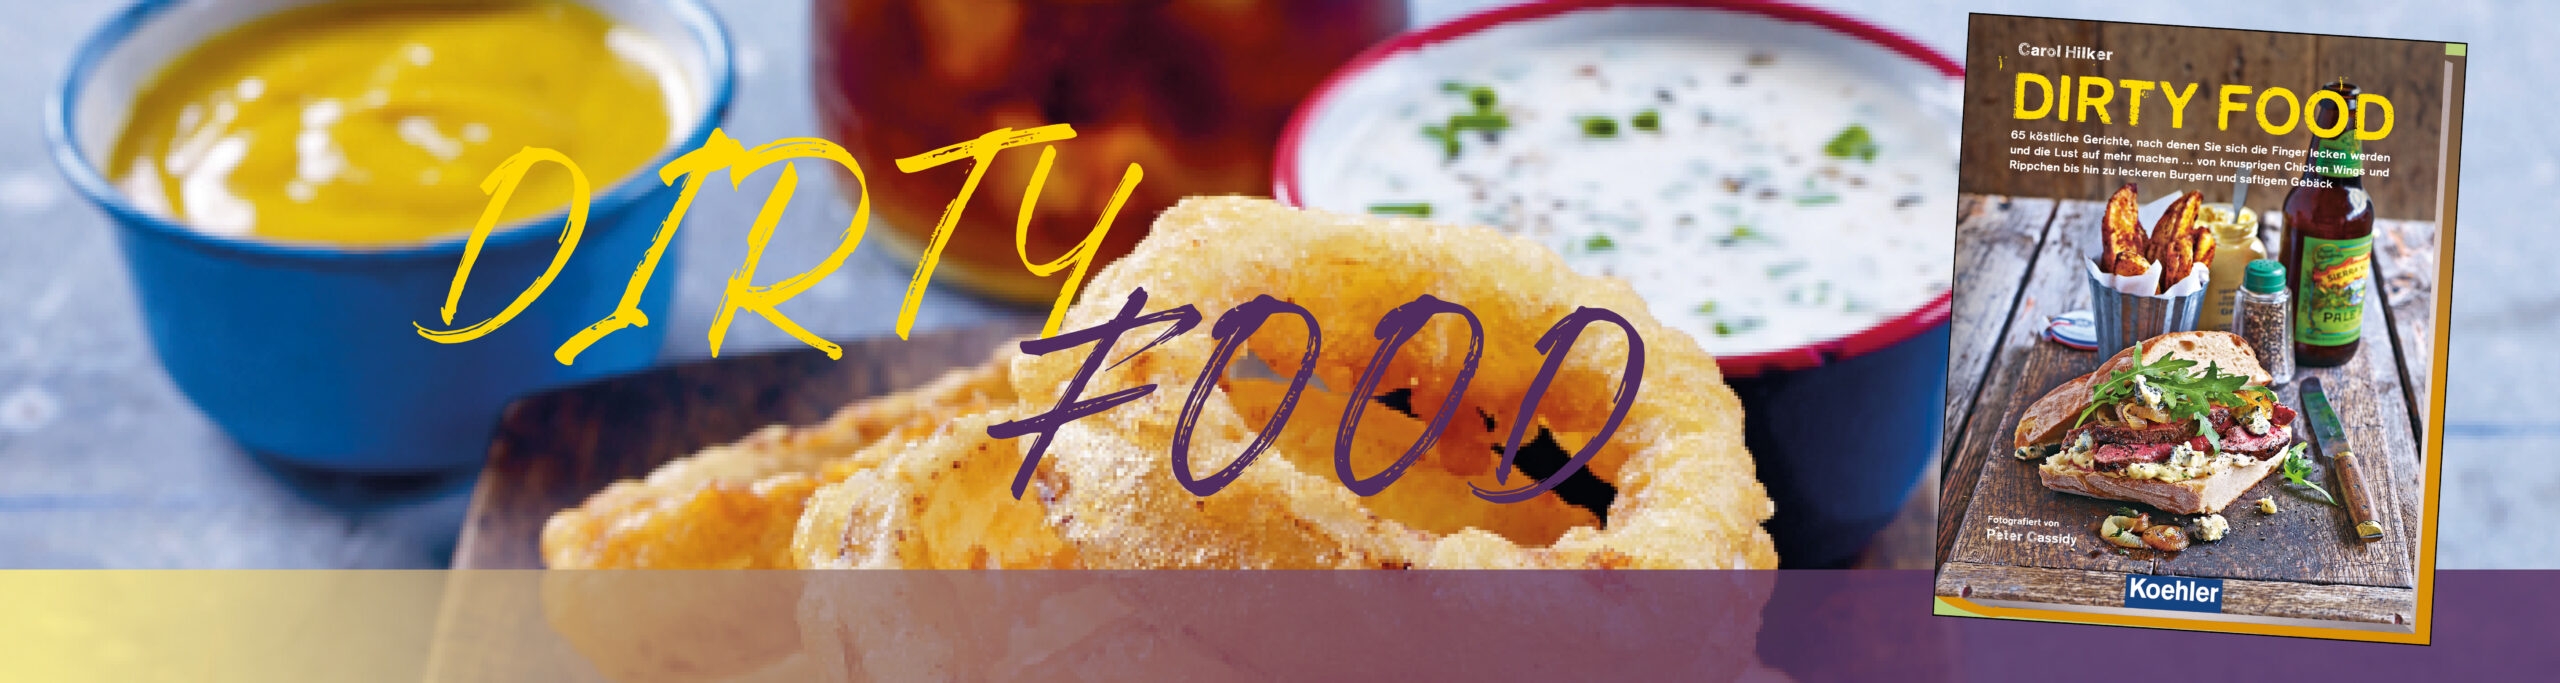 Dirty Food Web Slider